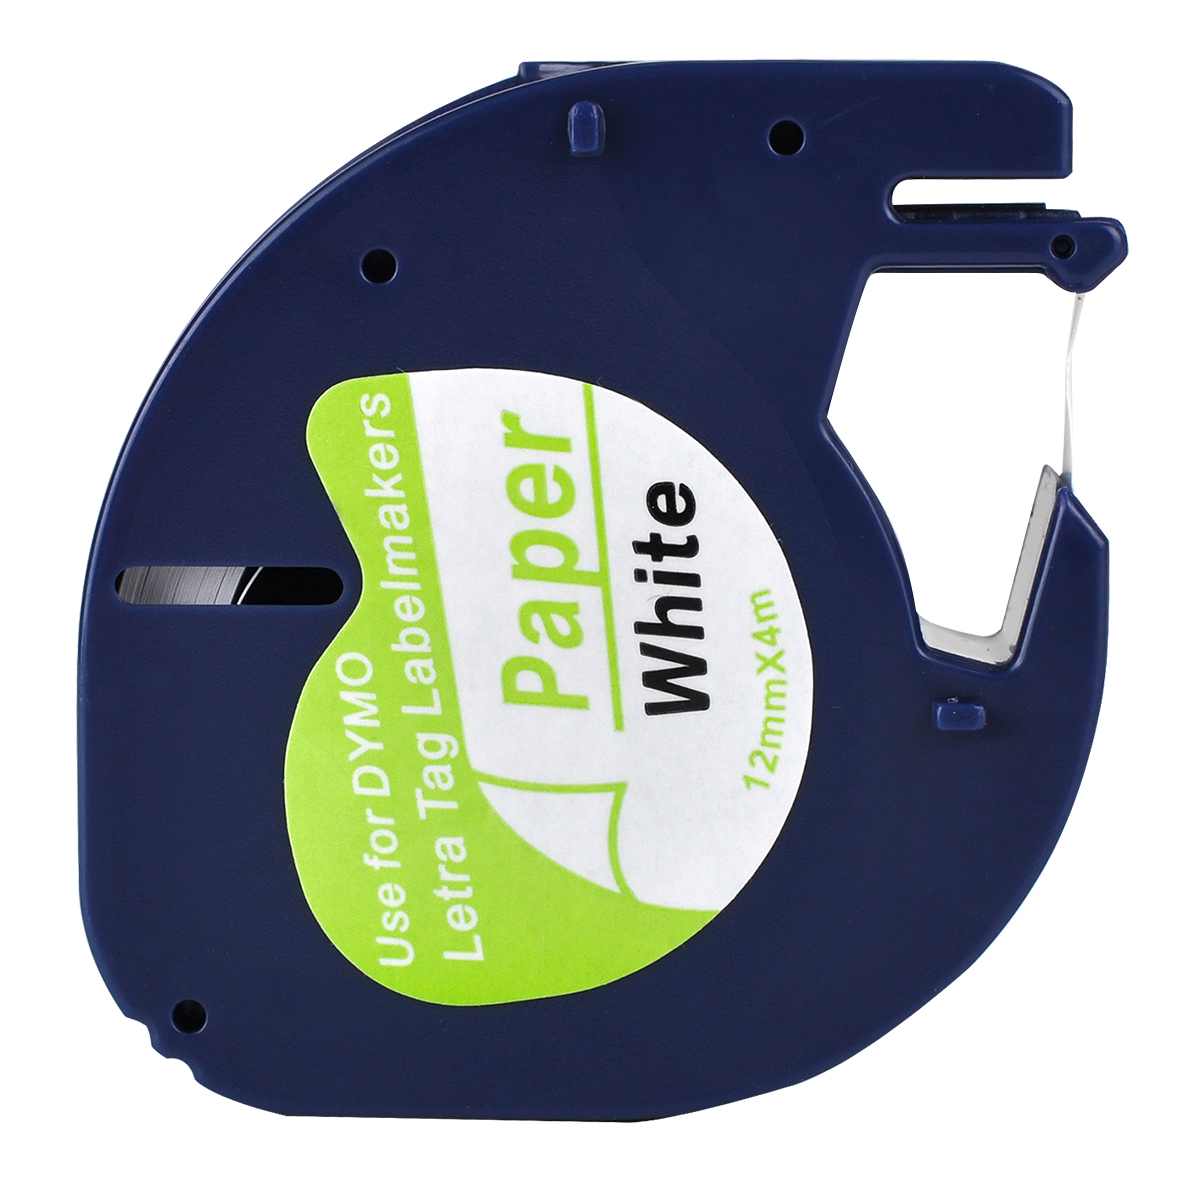 1 Kompatibel DYMO Letratag 91200 Hitam Putih (12 Mm X 4 M) kertas Label Tape untuk LT-100H, LT-100T, LT-110T, QX 50, XR, Xm title=